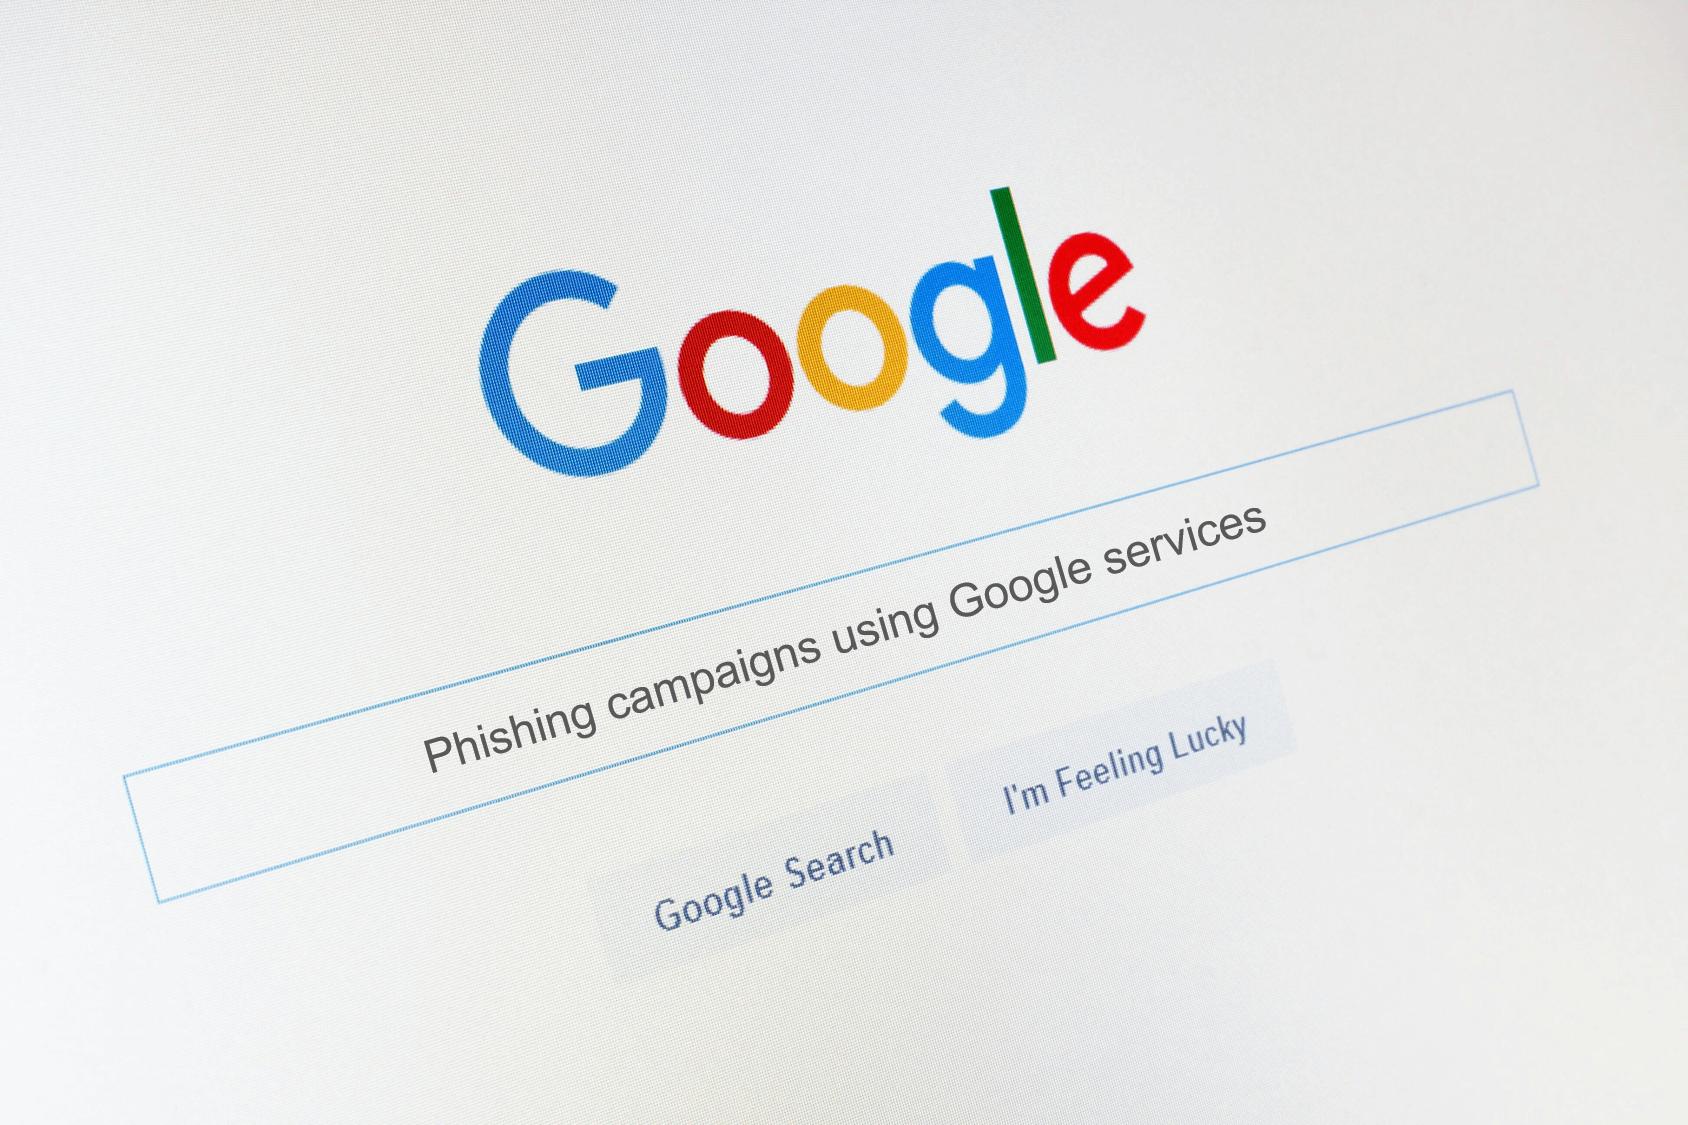 OK Google, Build Me a Phishing Campaign